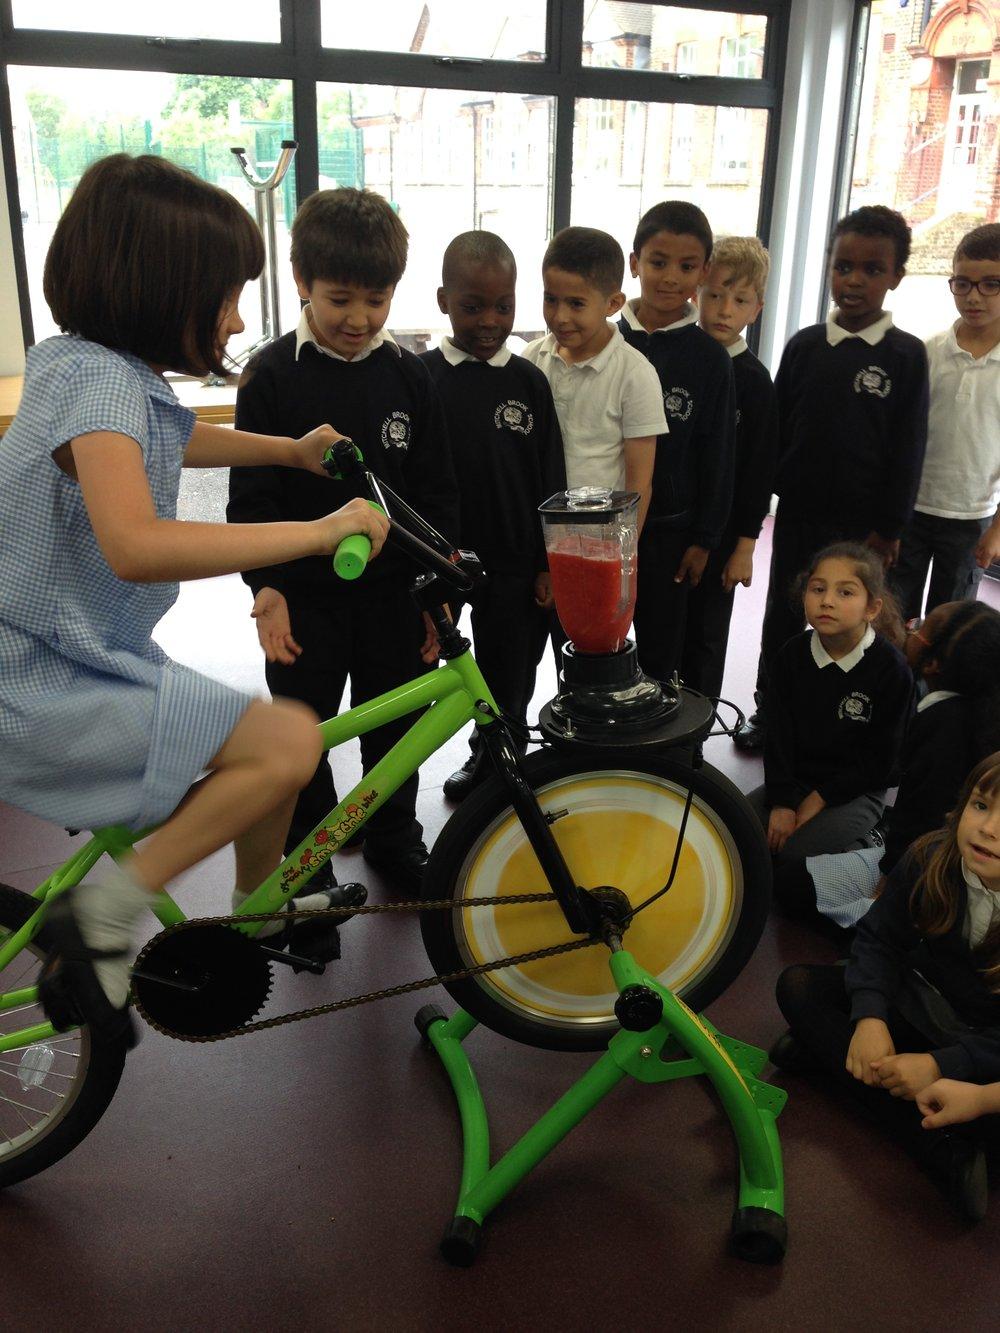 Urban Smoothie Bikes School